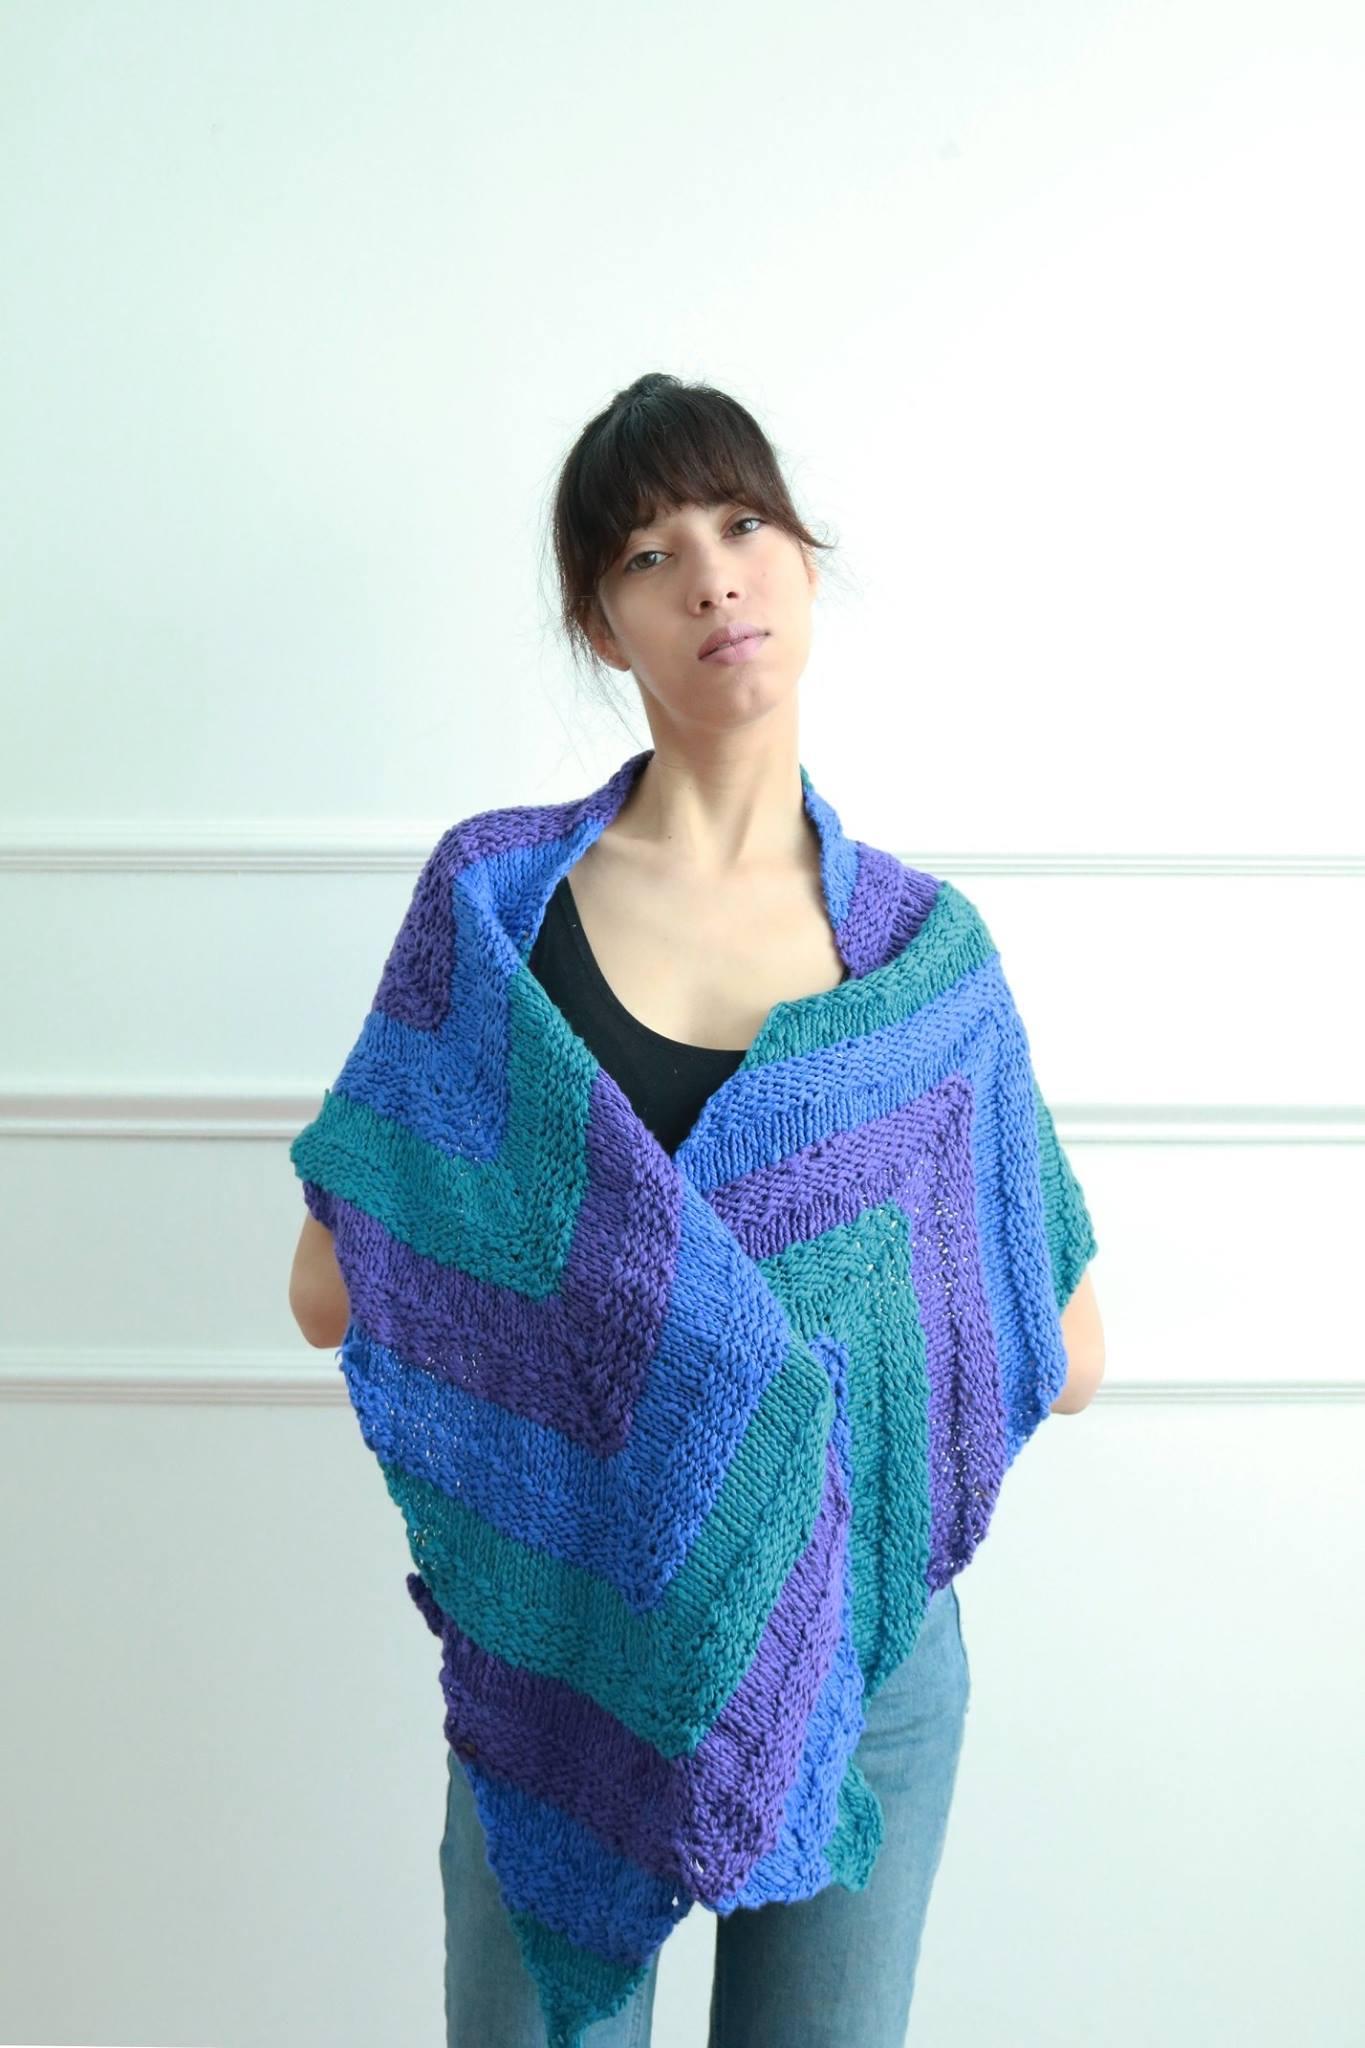 skye knit crate.jpg